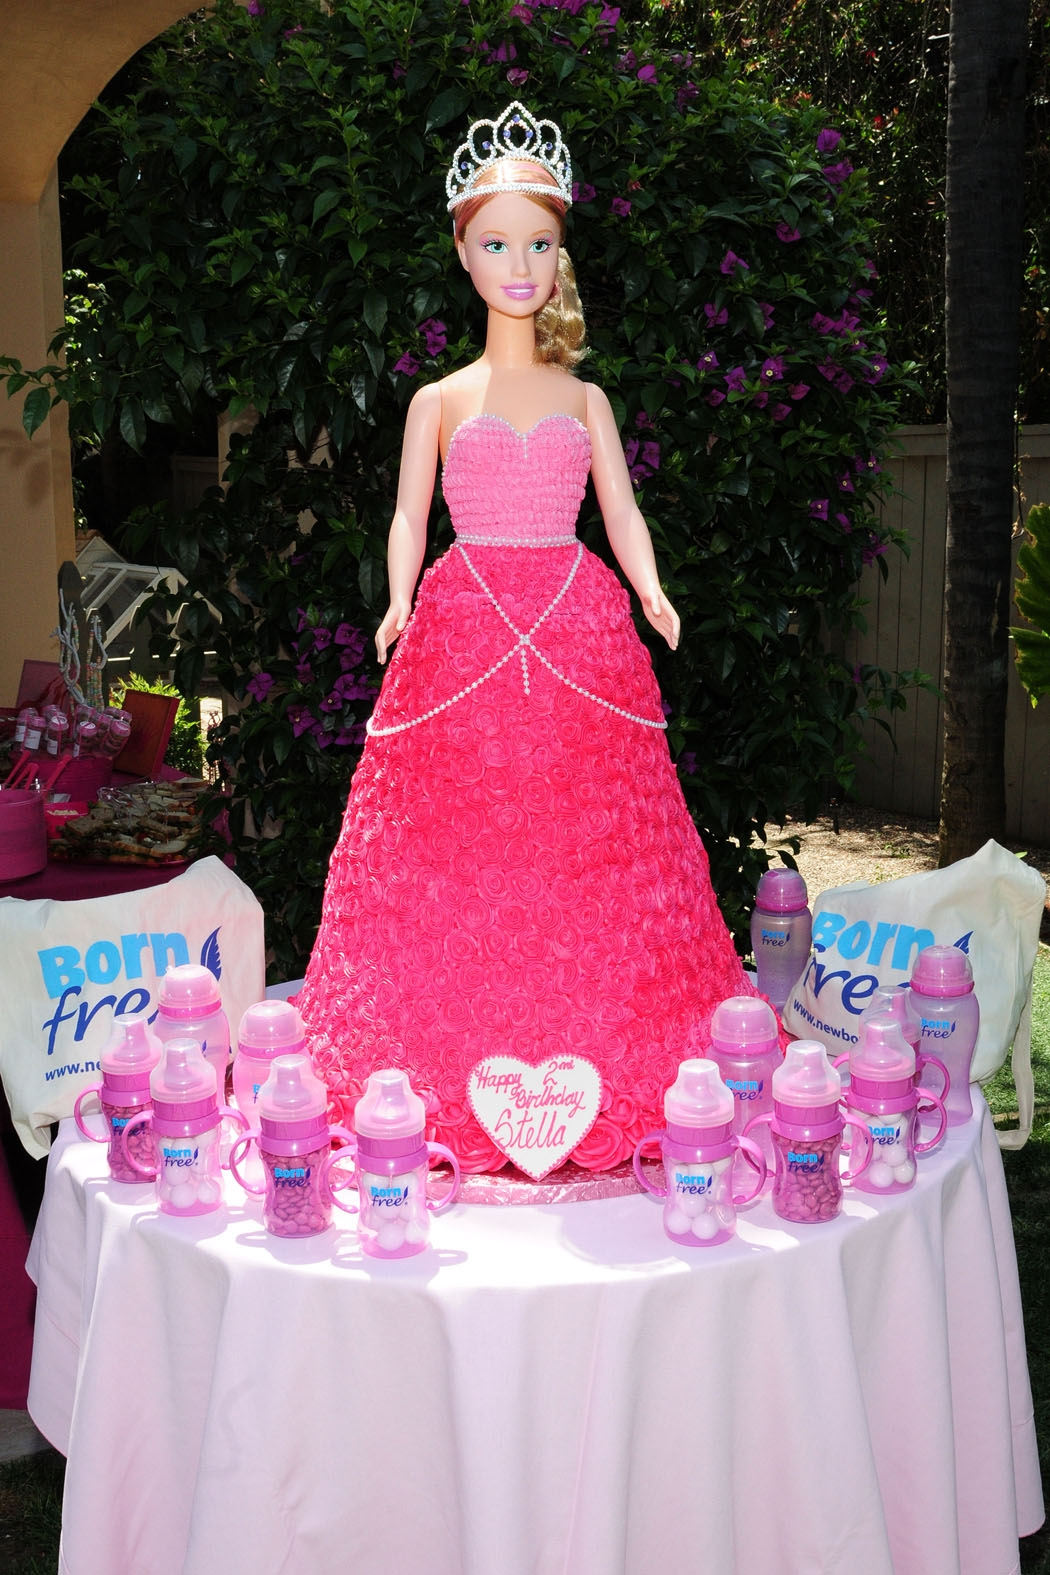 http://4.bp.blogspot.com/_5CqMSP13w1w/TCKVnhMlQAI/AAAAAAAADps/TE4ekFpBlJs/s1600/Barbie+Cake+.jpg